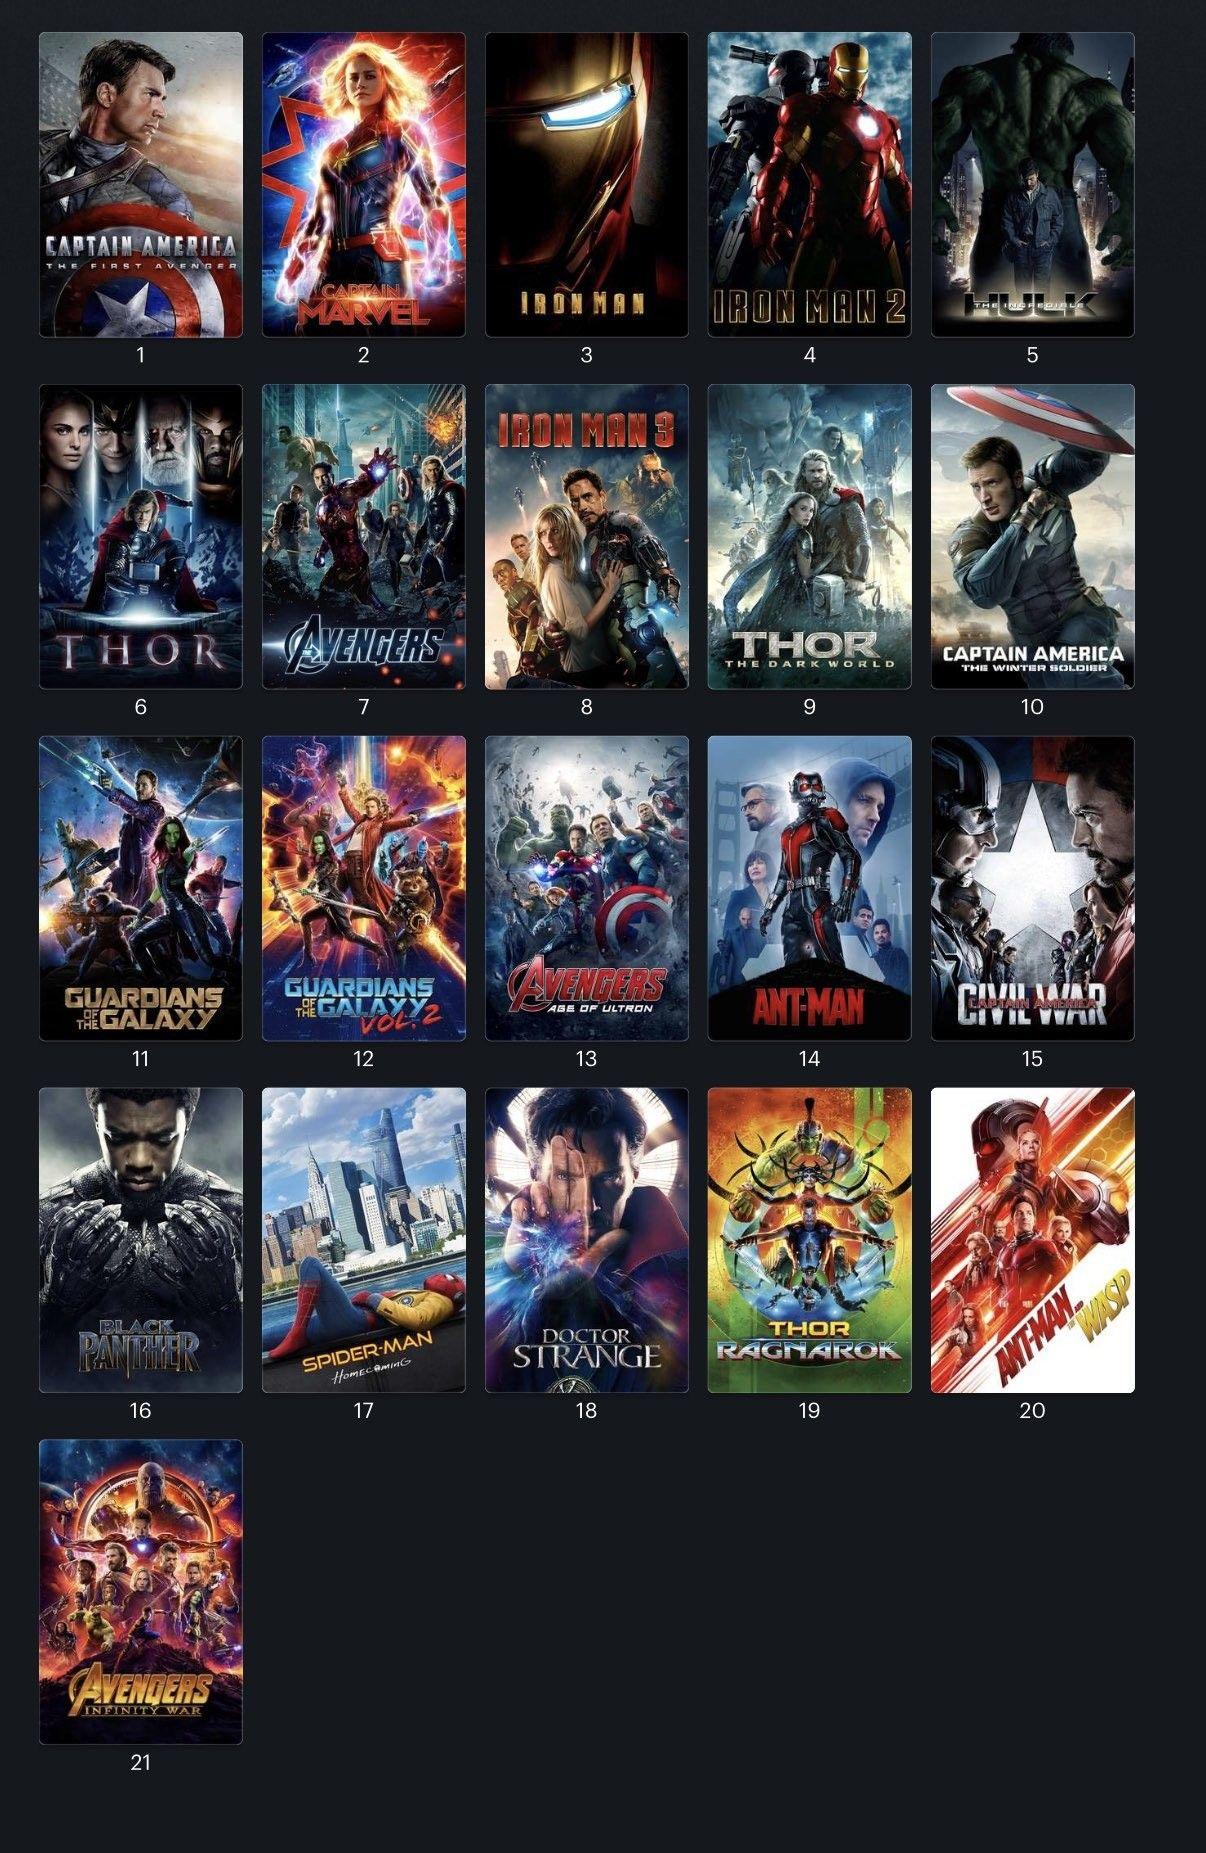 Marvelcomics Chronological Order Marvel Comics Marvel Marvel Iron Man Tom Holland Spiderman